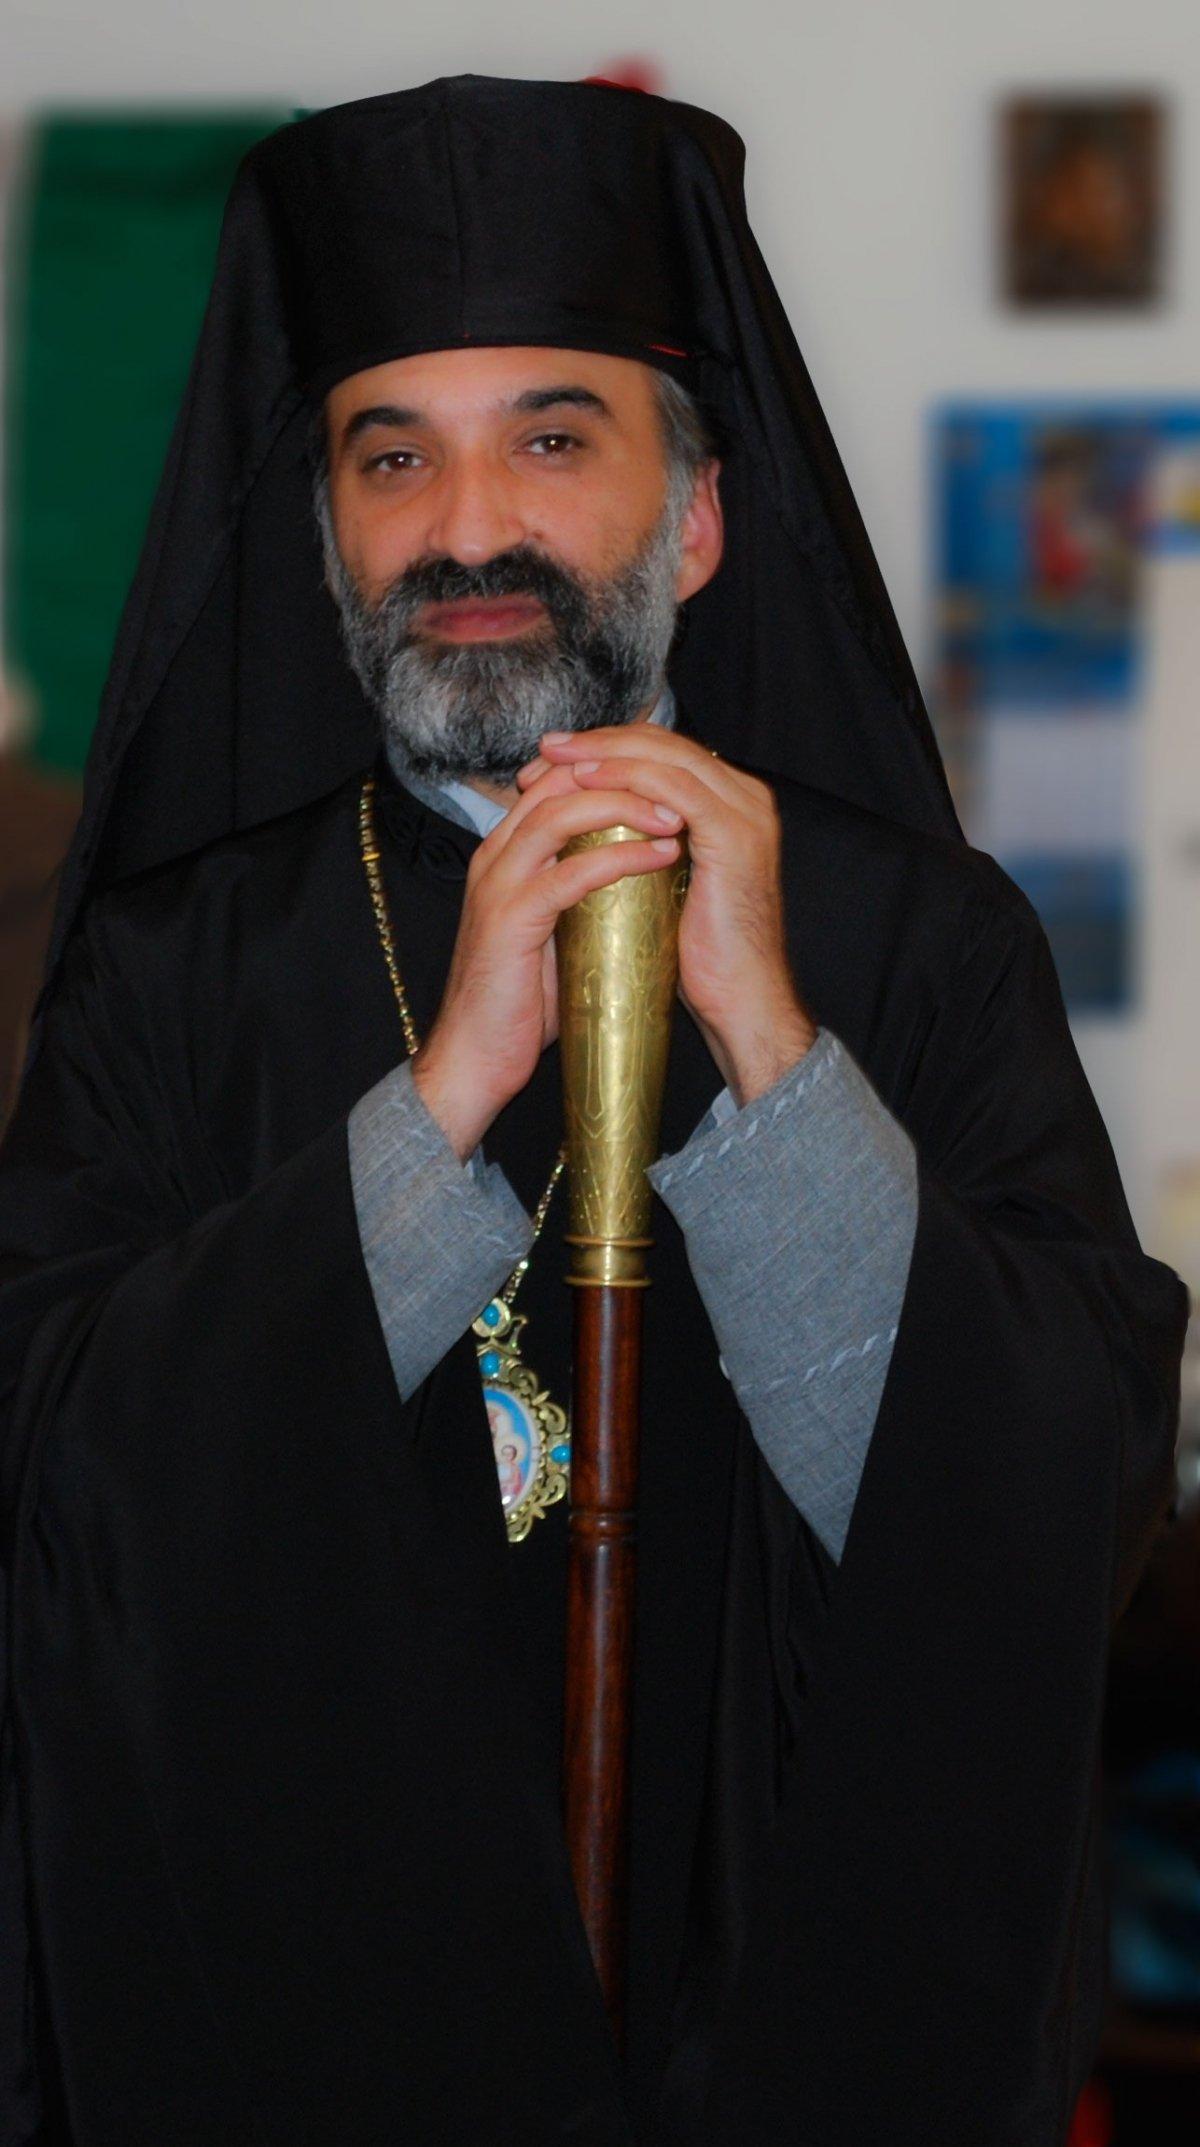 + ВИСАРИОН Архиепископ на Мюнхен